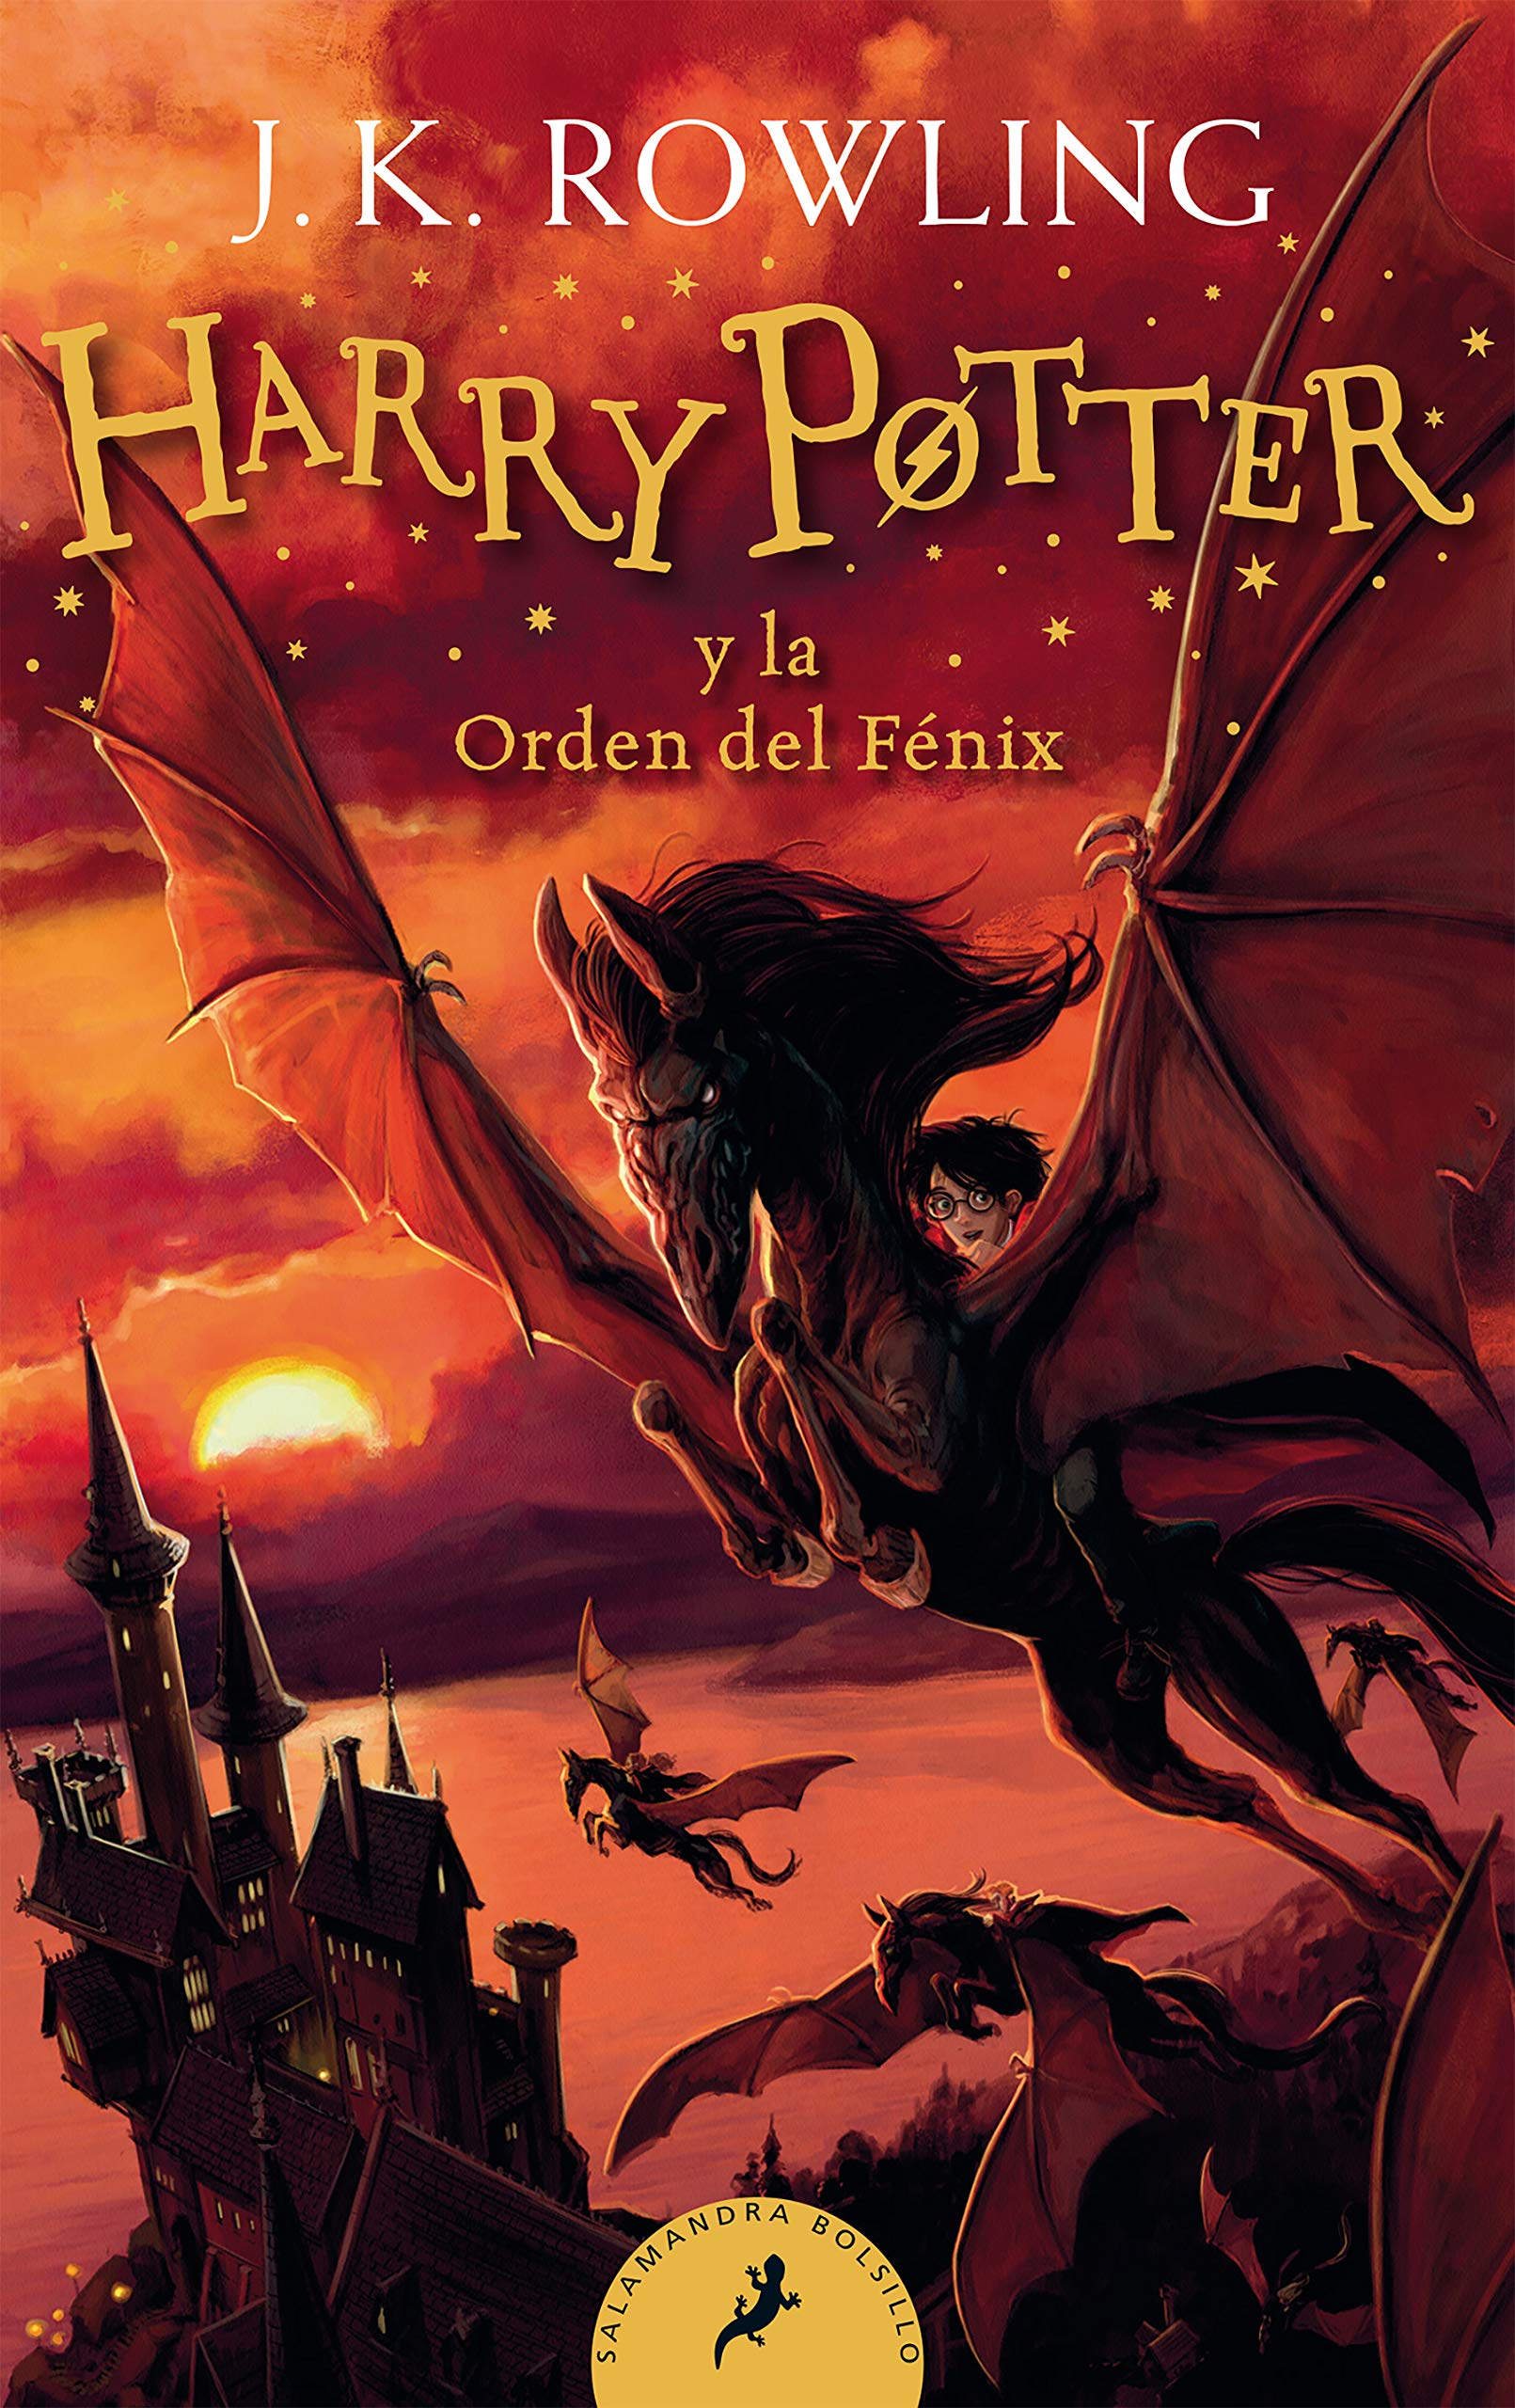 Harry Potter Y La Orden Del Fenix Harry Potter And The Order Of The Phoenix Spanish Edition Rowling J K 9781644732113 Amazon Com Books